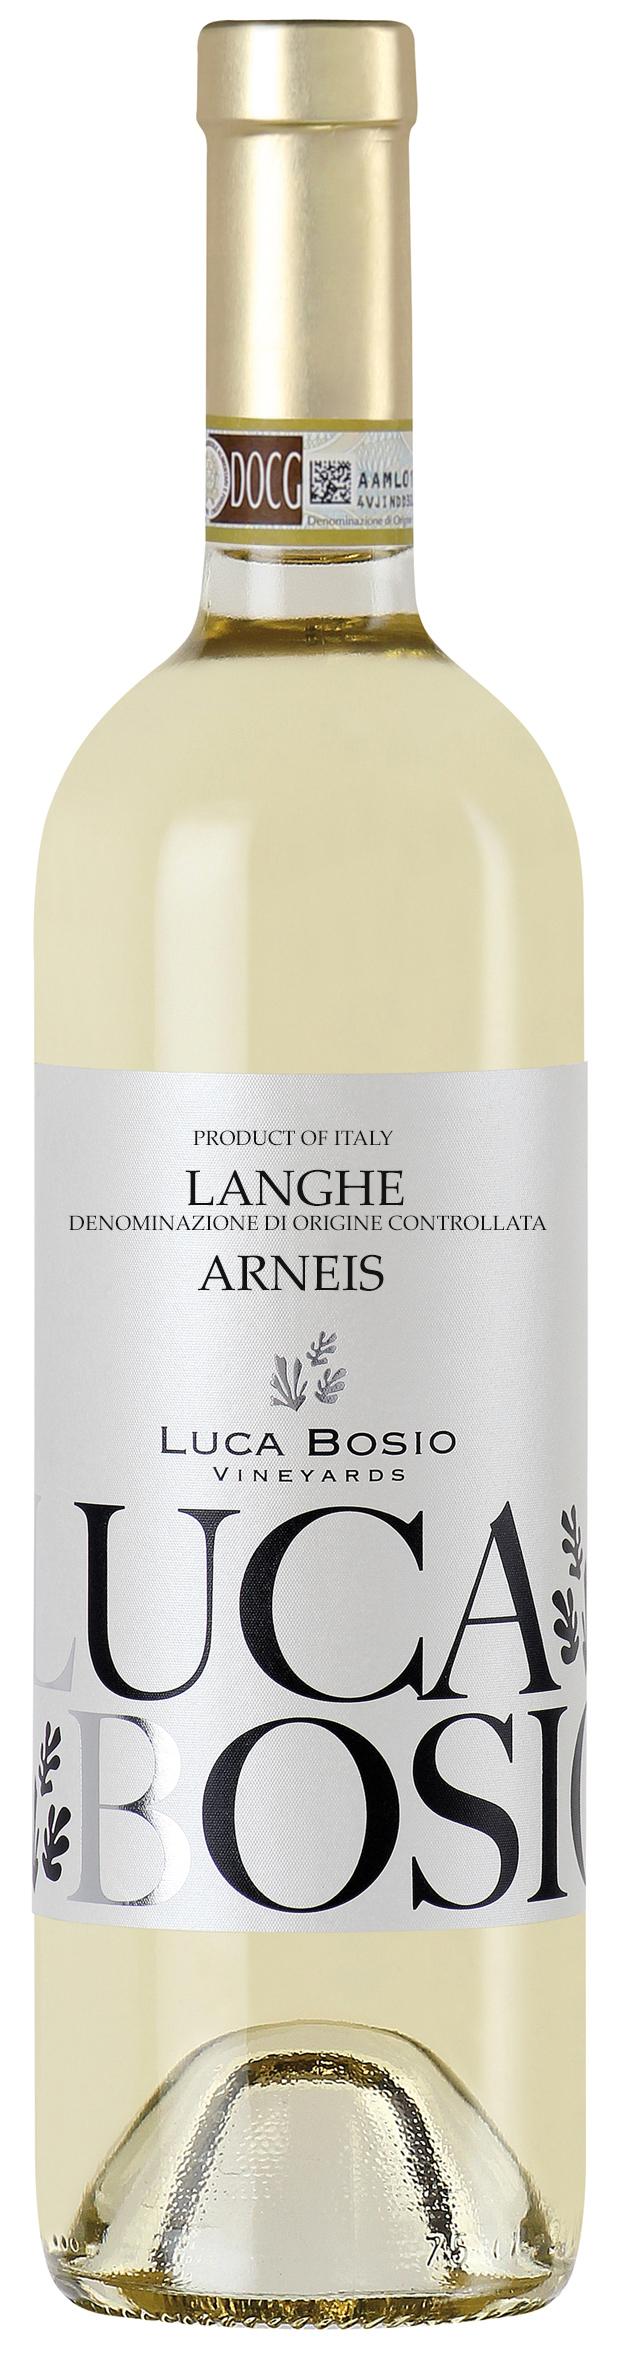 2016 Luca Bosio Arneis Langhe DOCG